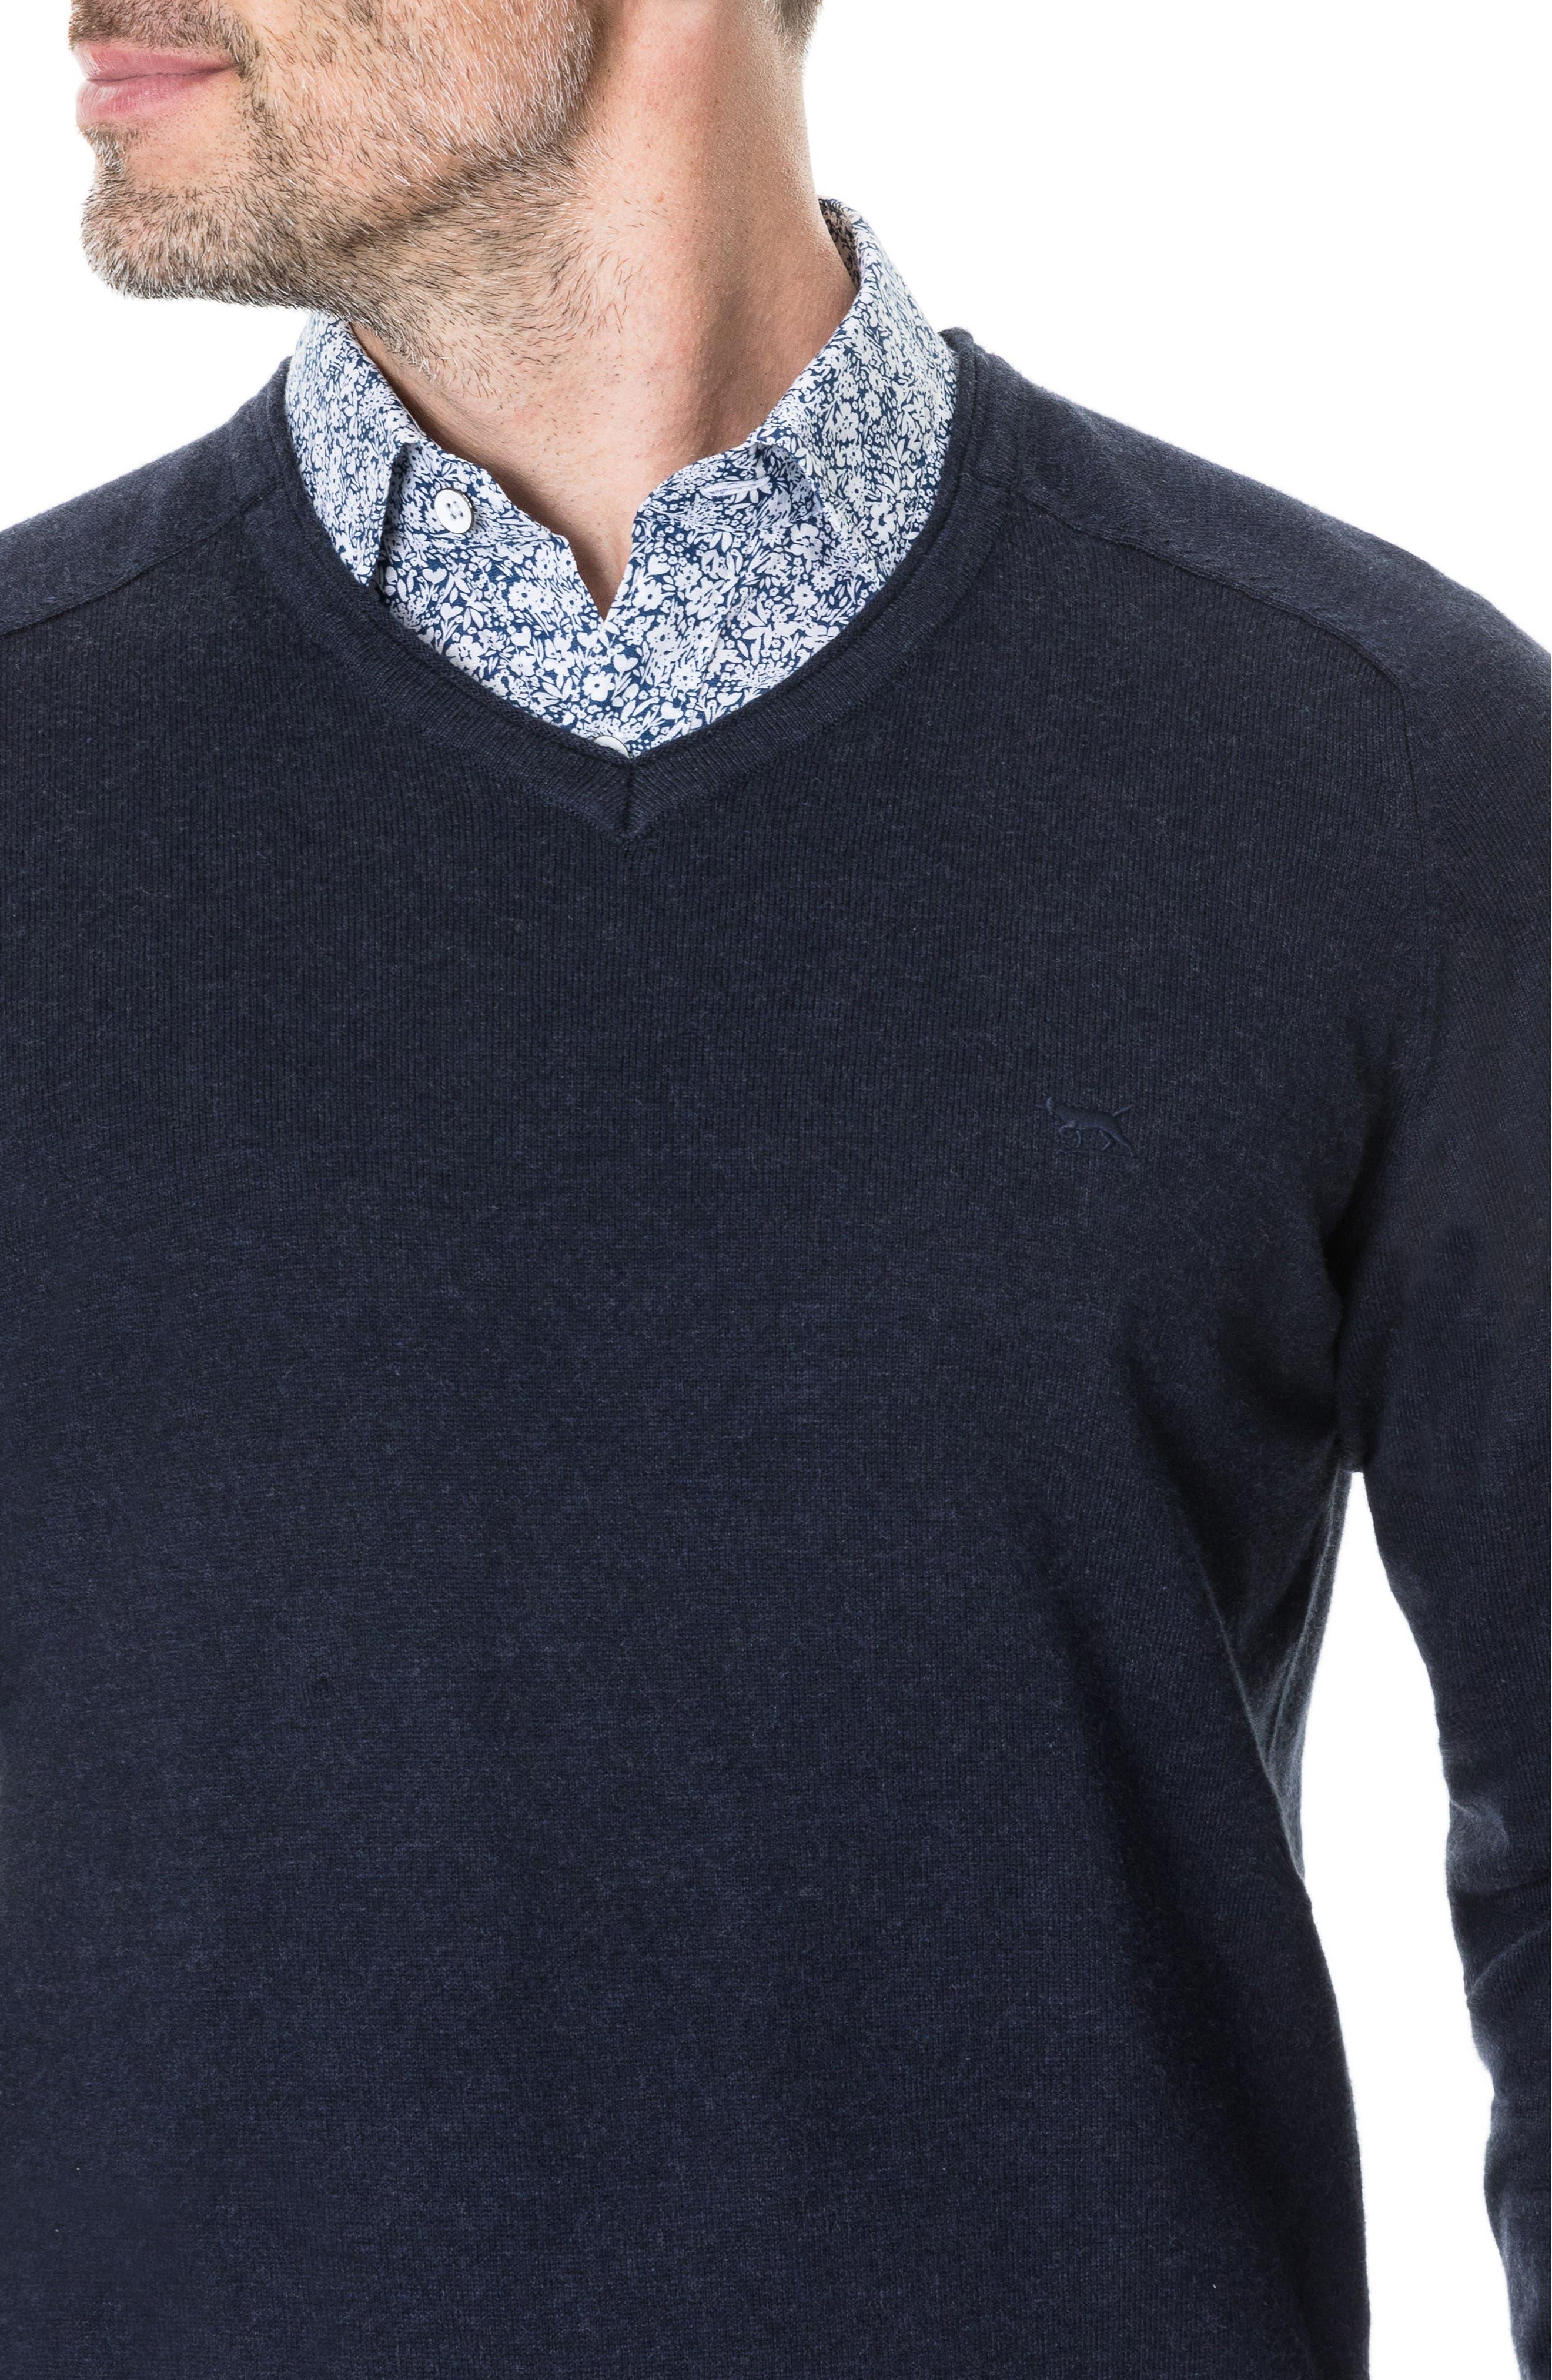 Arbors Cotton V-Neck Sweater,                             Alternate thumbnail 12, color,